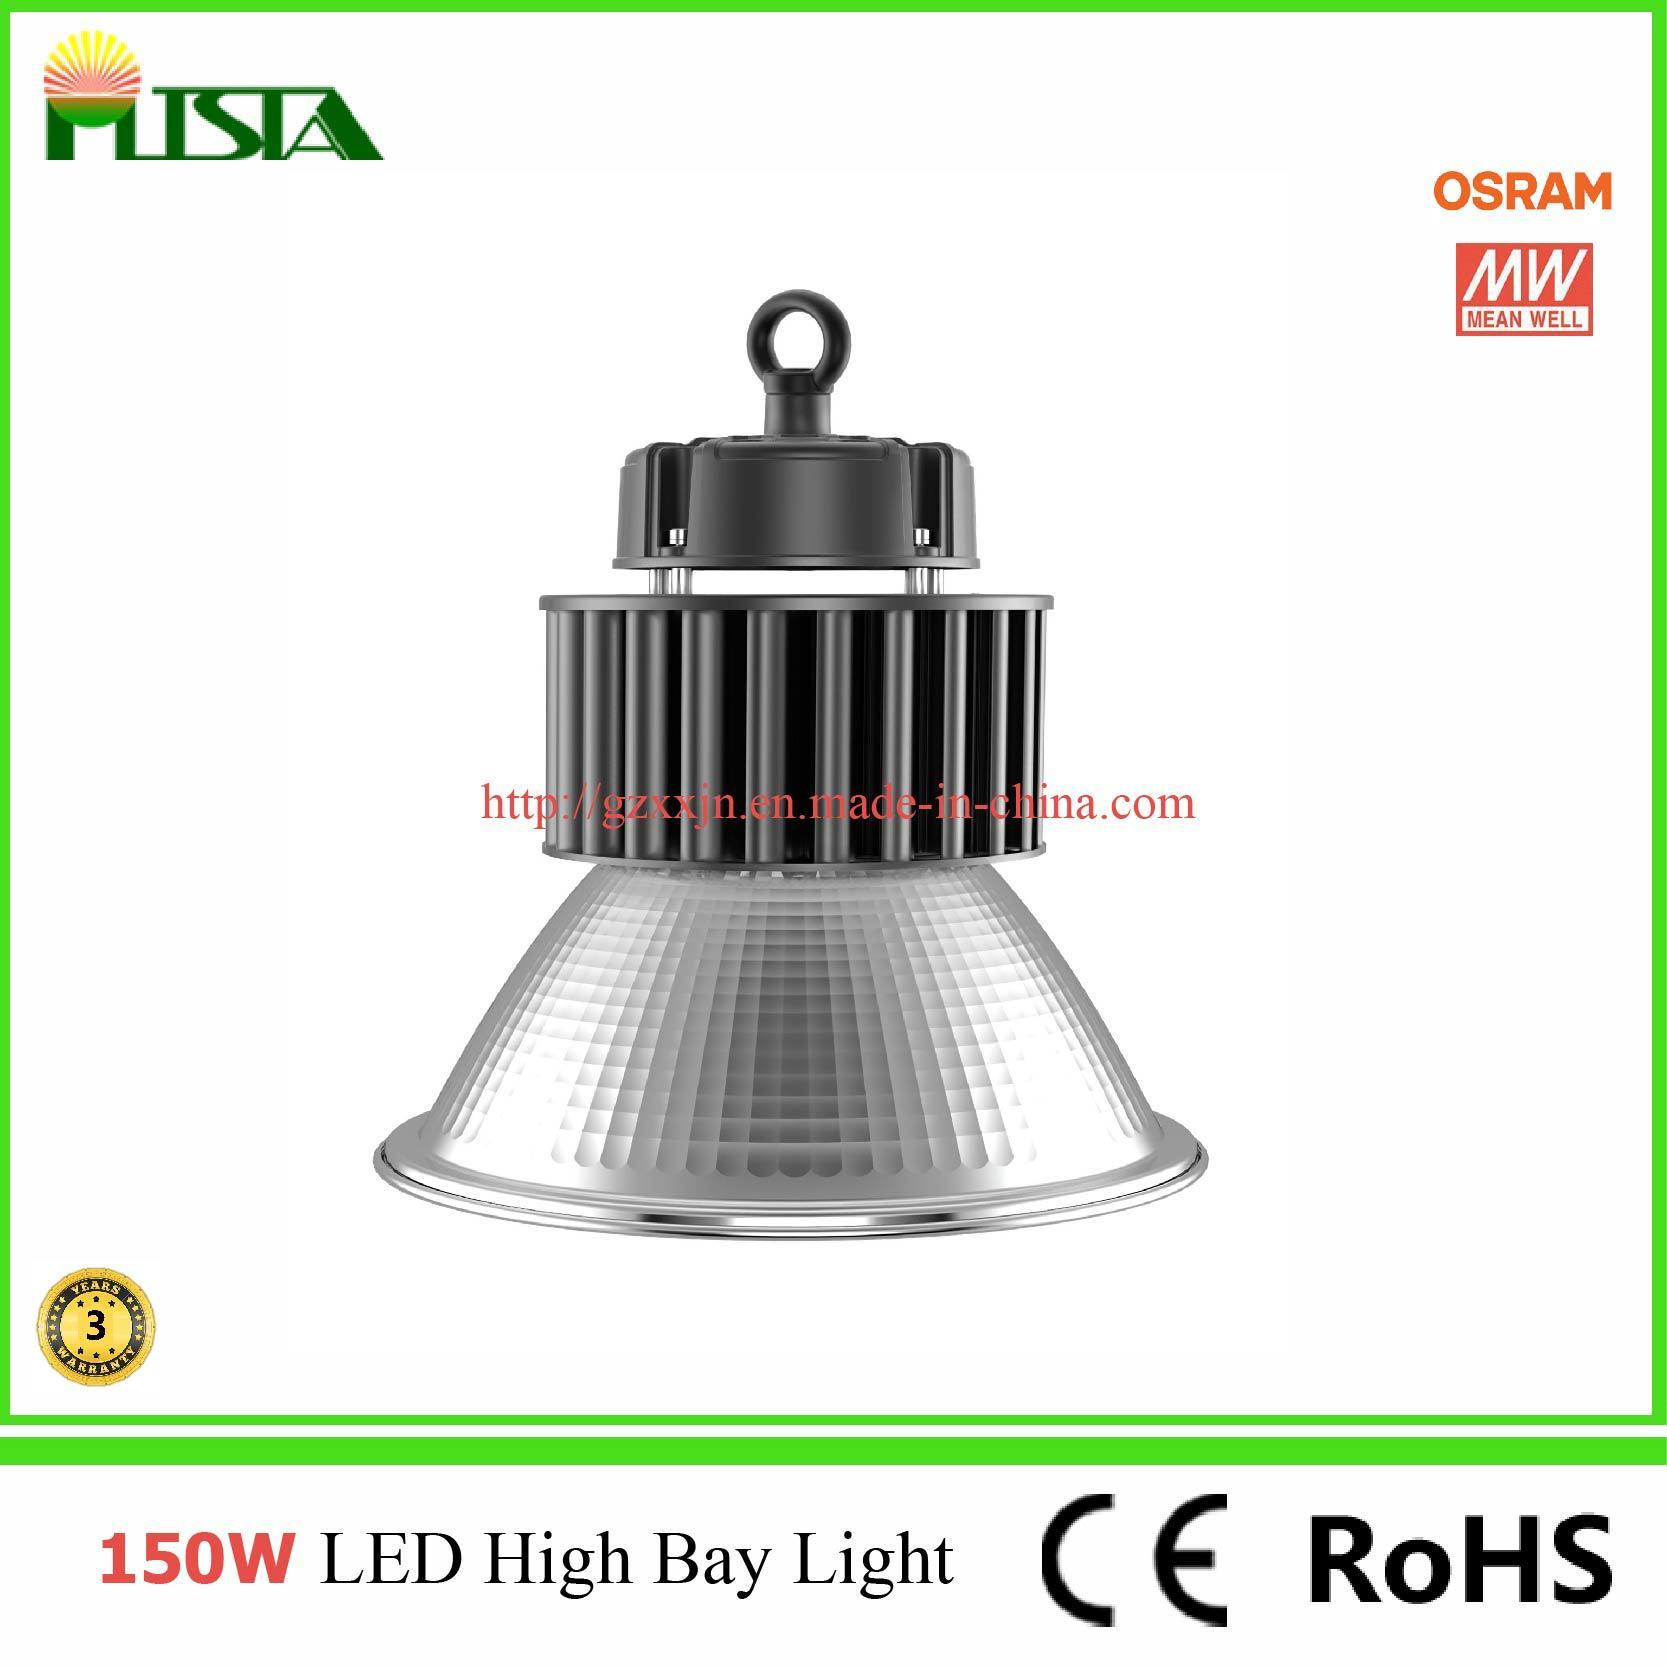 China 150w High Bay Led Light Ip44 With Osram Led Chip